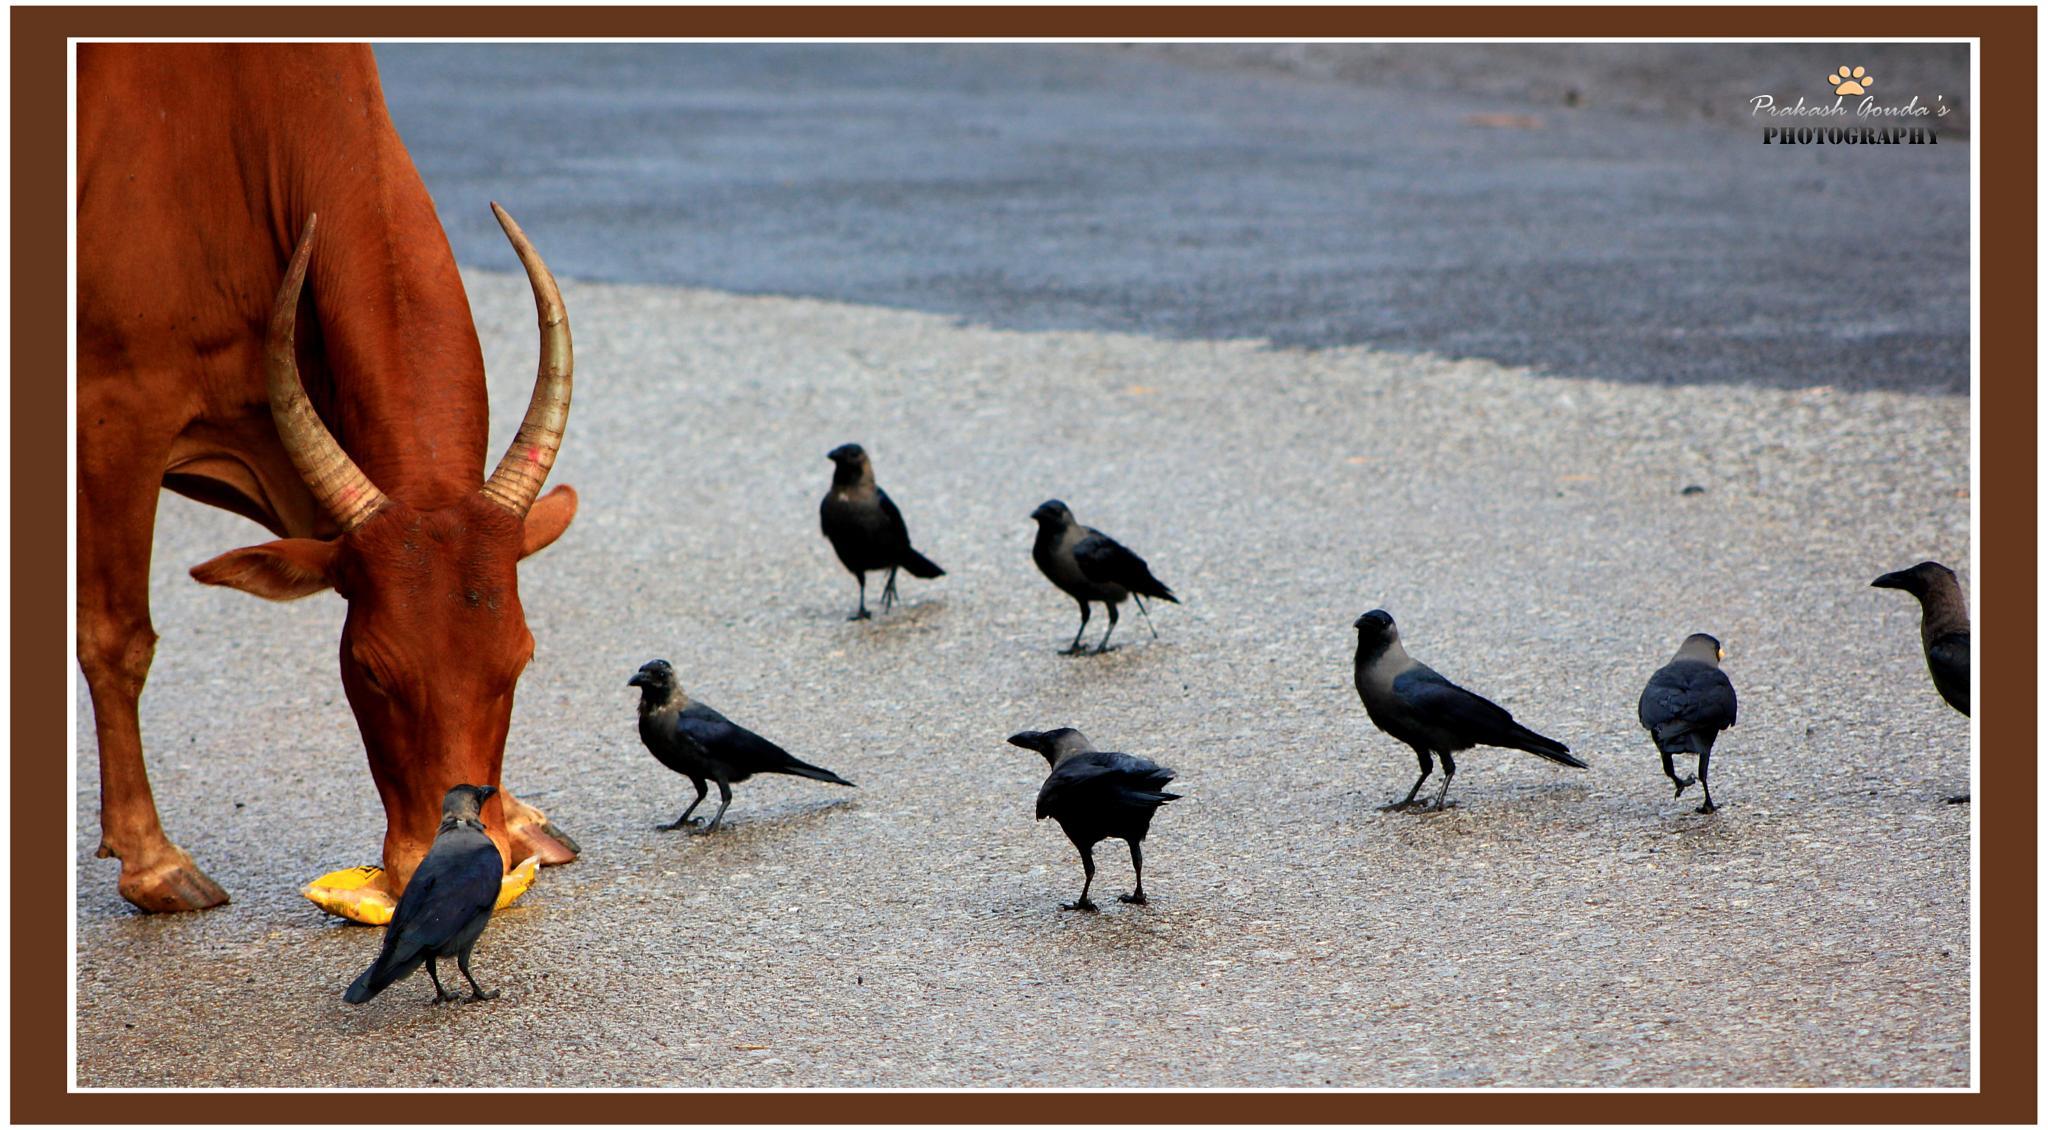 Cow and Crow by PrakashGouda